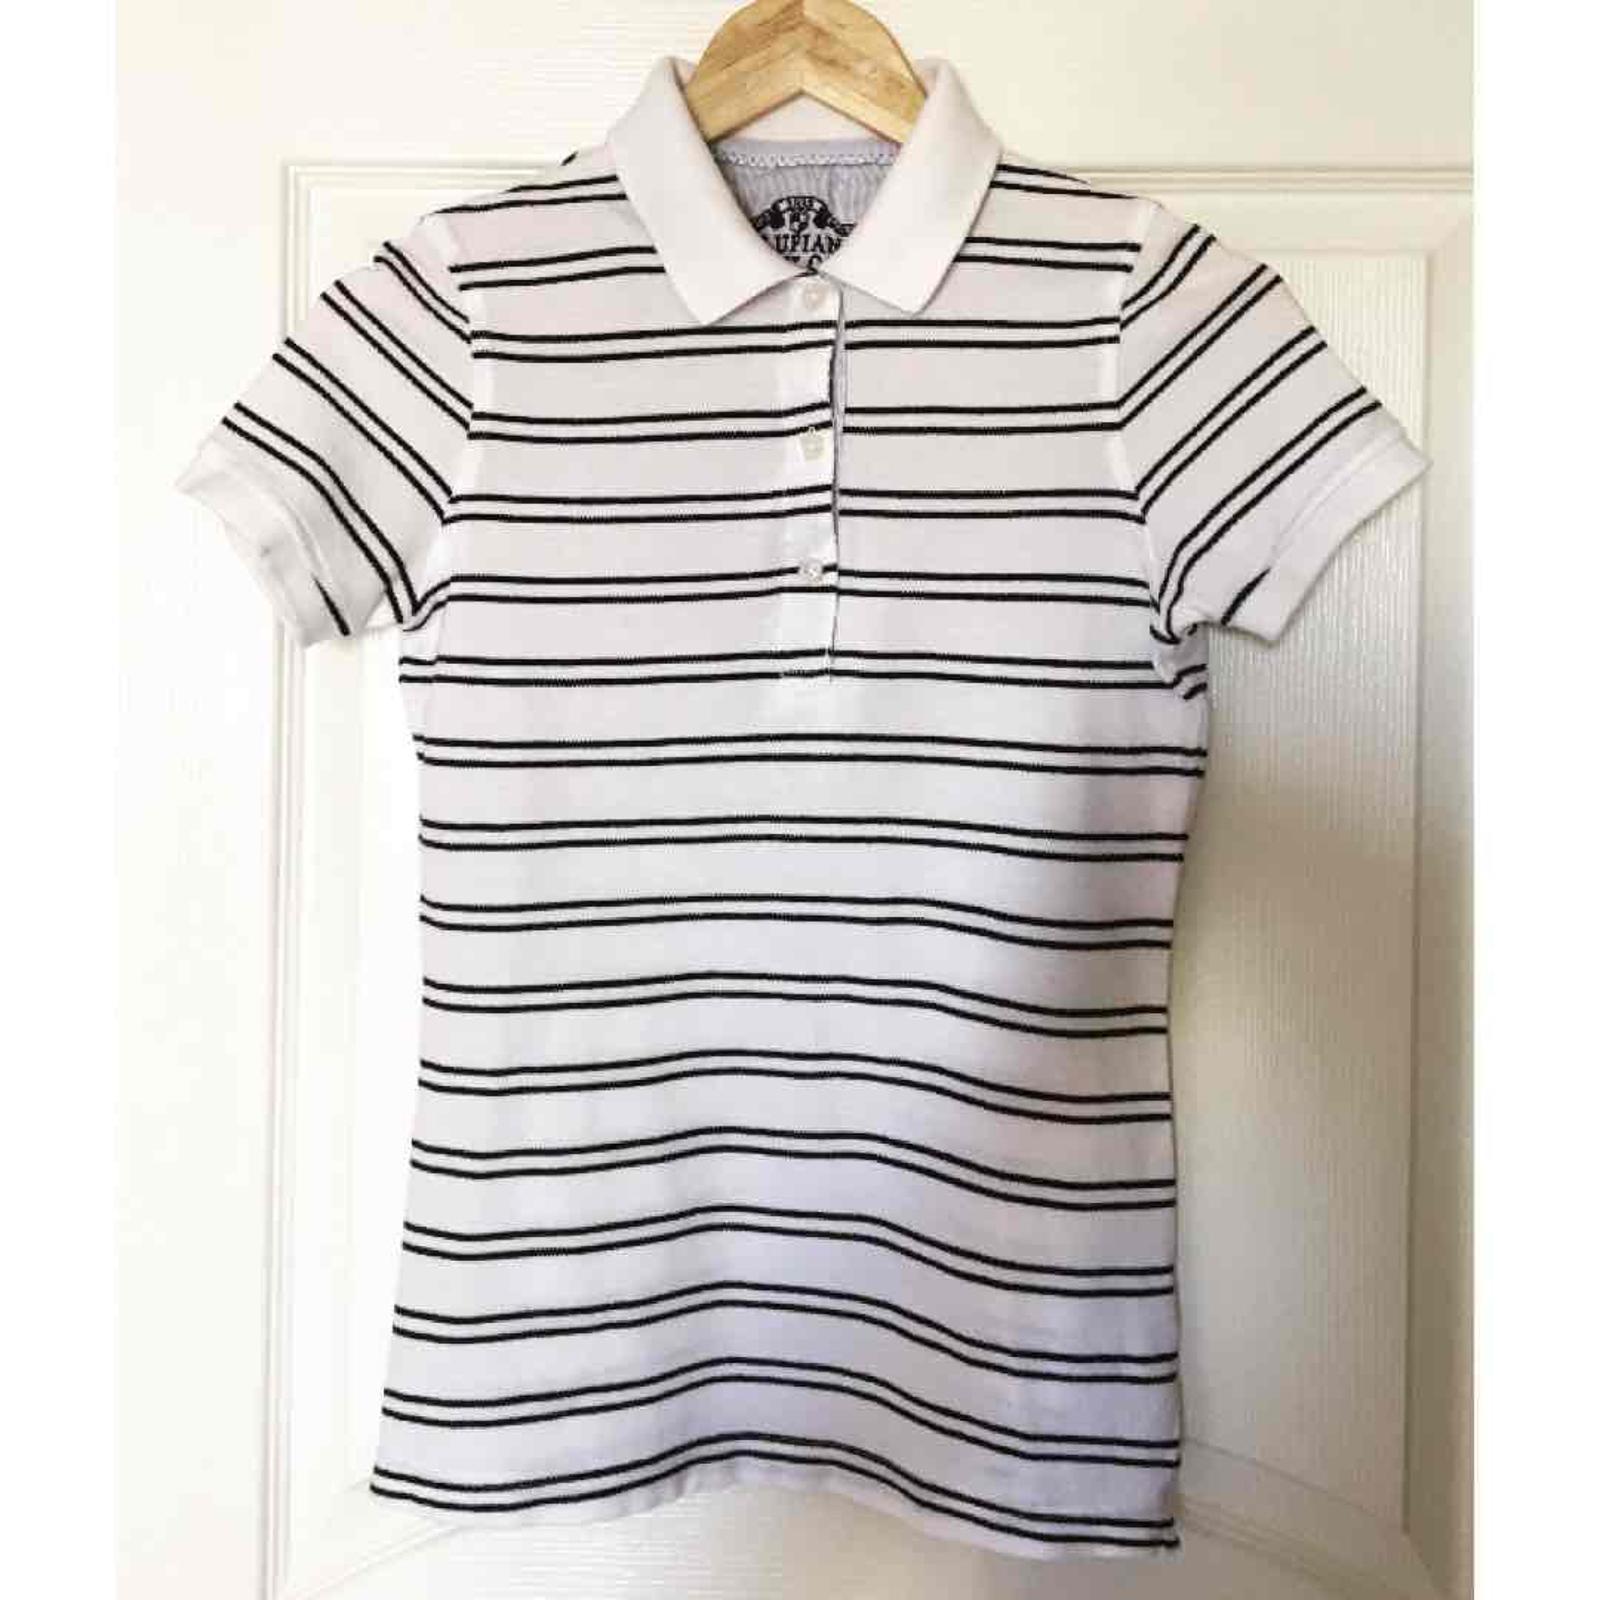 Lufian Tshirt